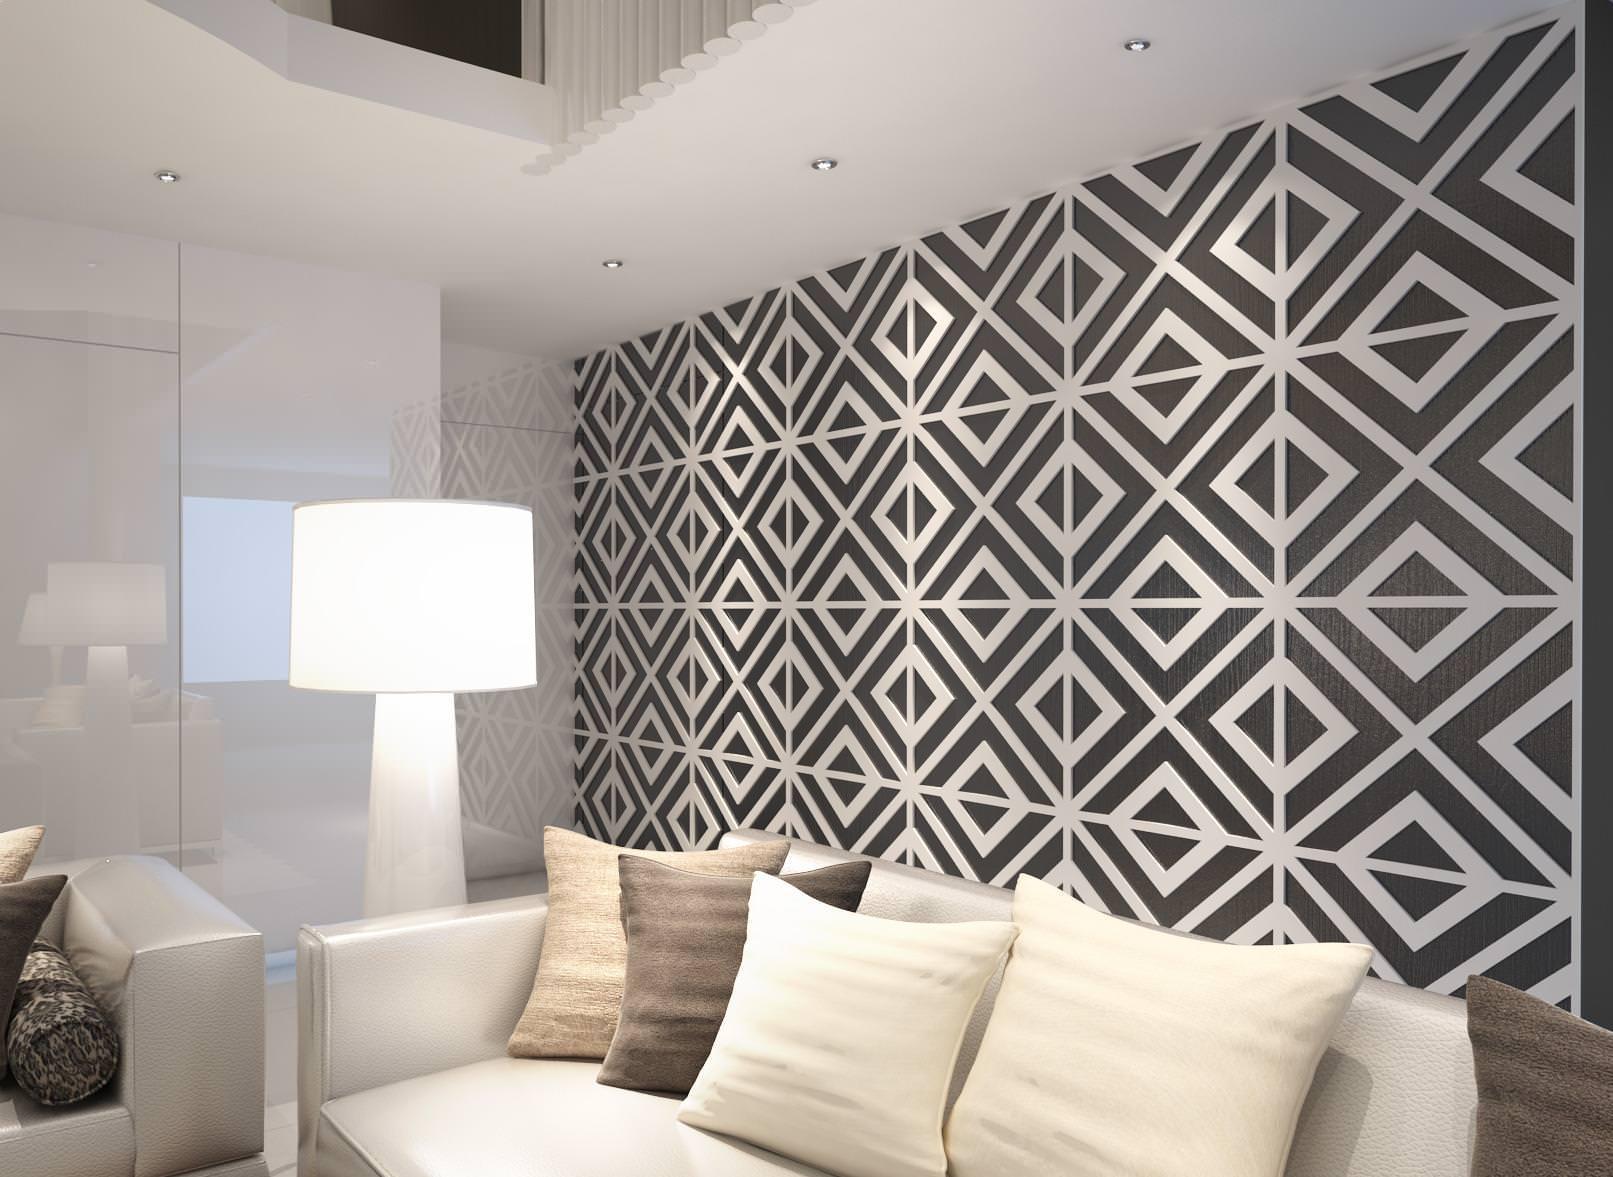 Paredes 3d padr o moderno - Materiales para forrar paredes interiores ...